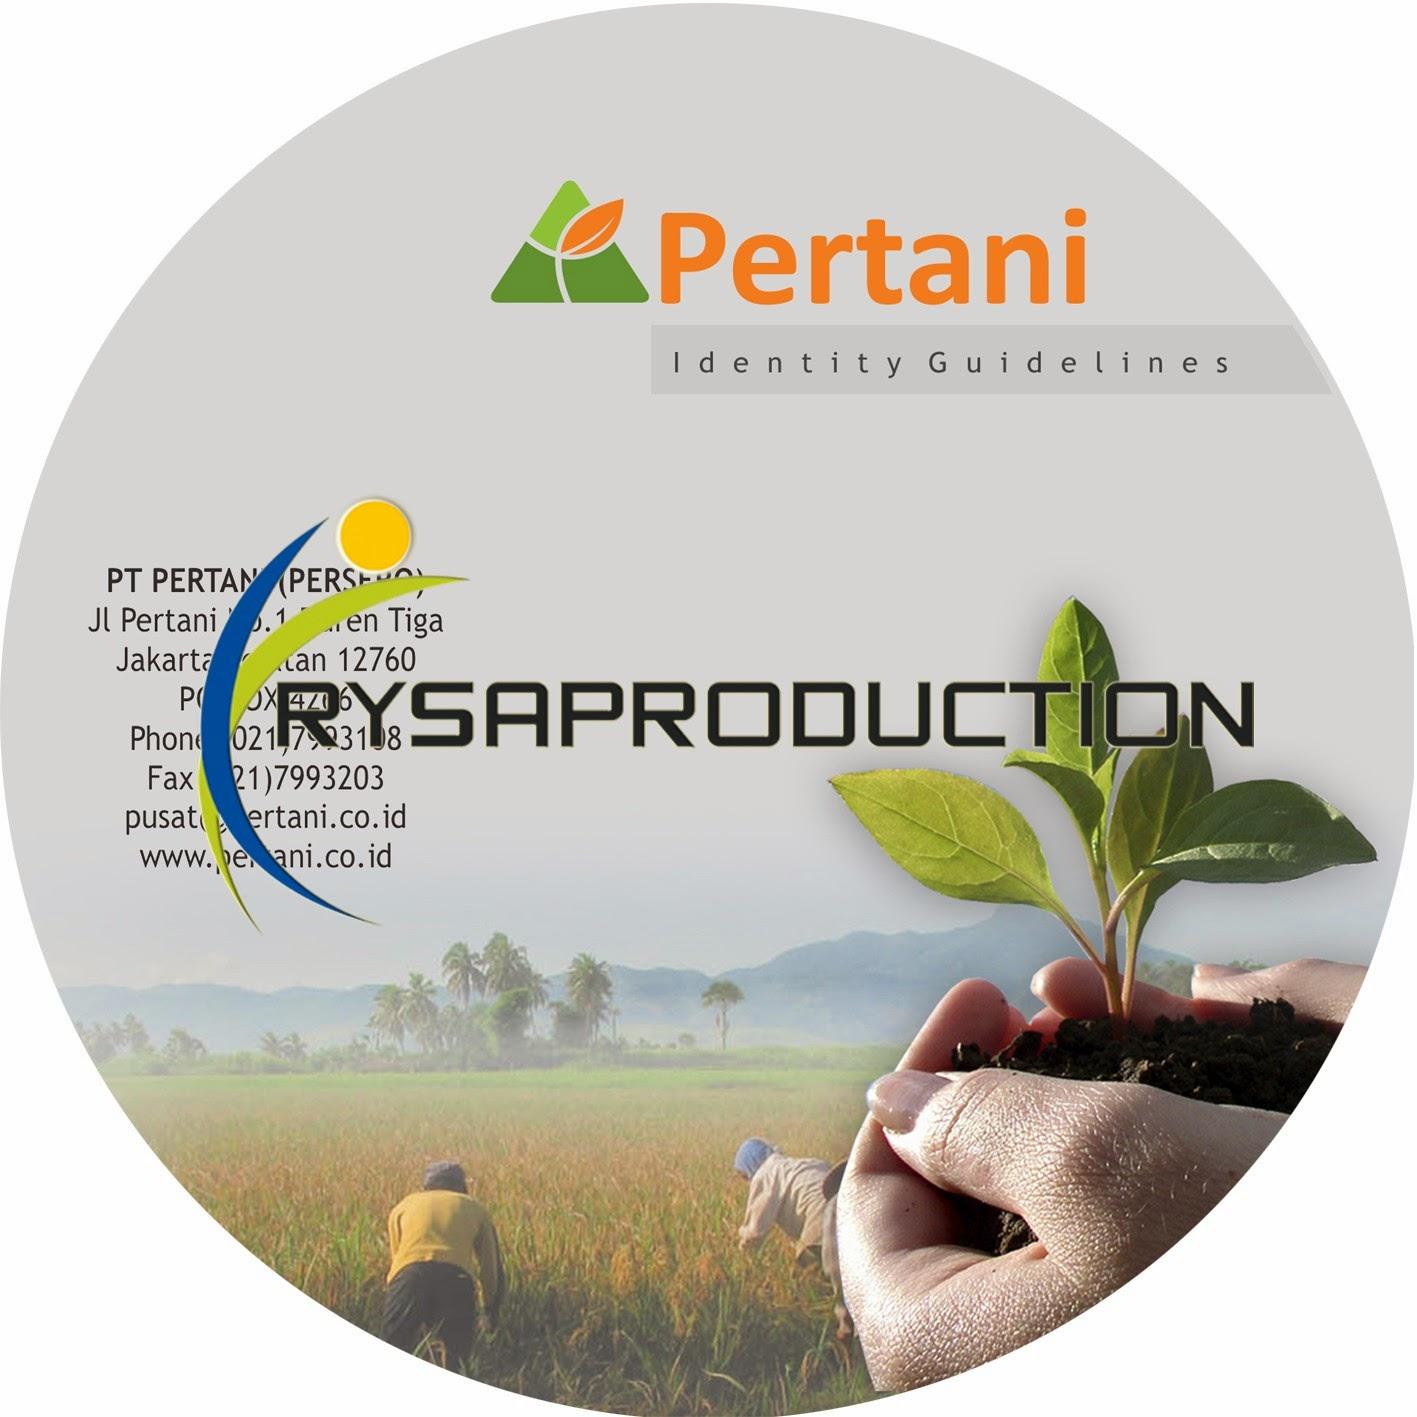 PT Pertani Persero